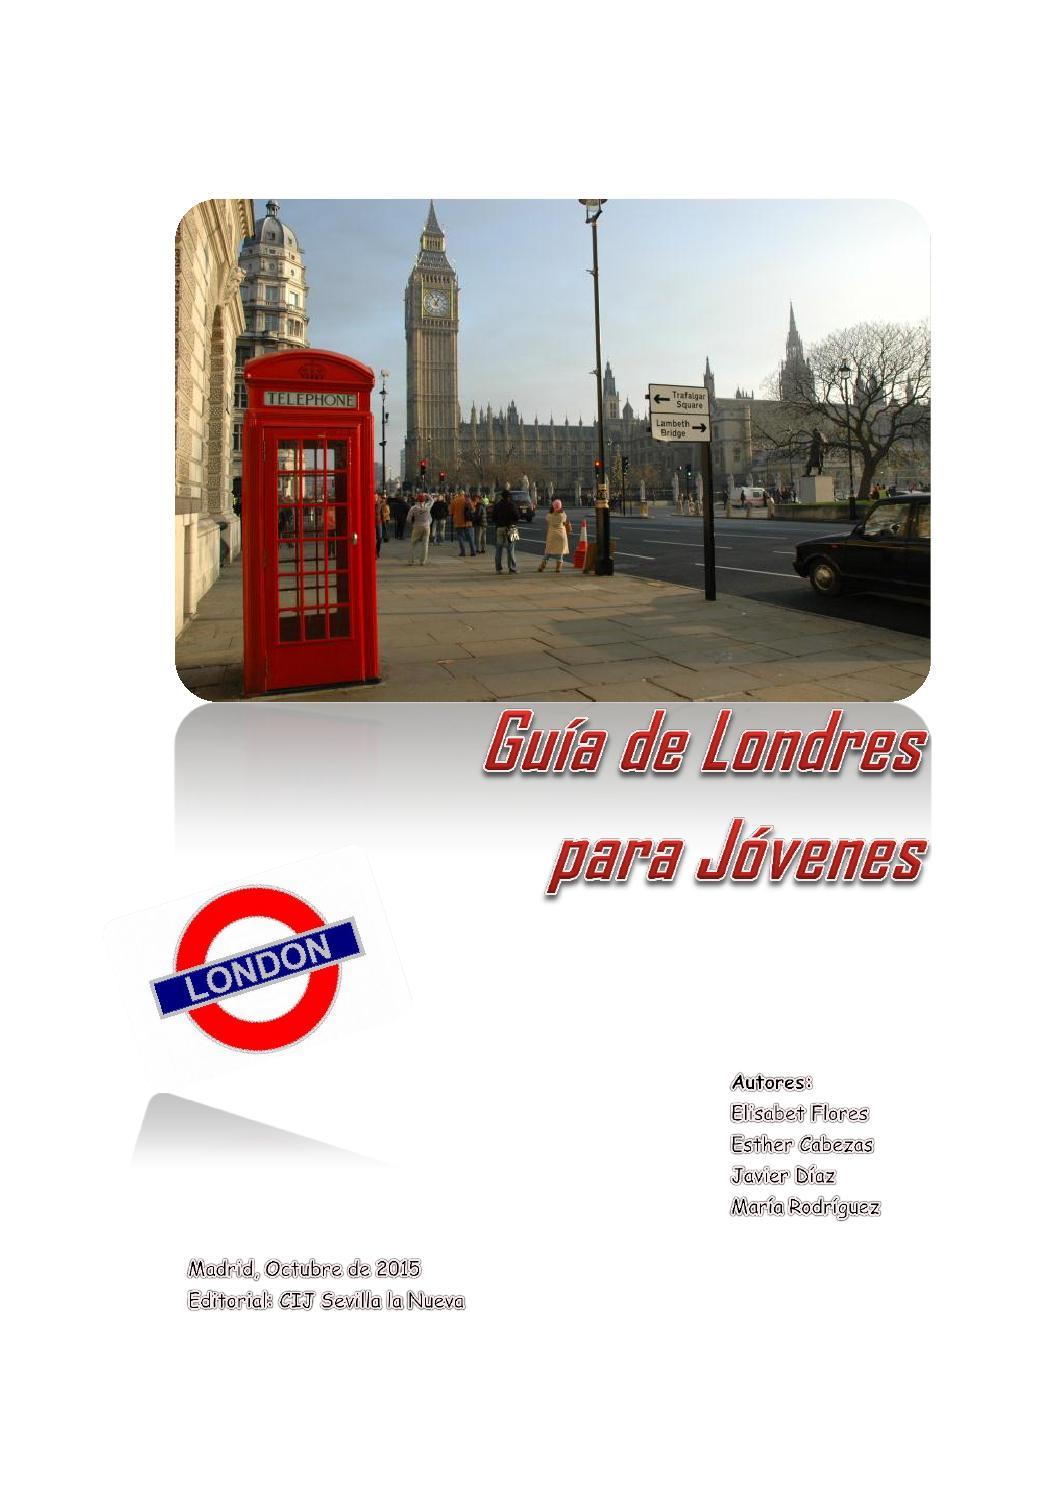 guia londres by Maite Dinamizacion - issuu